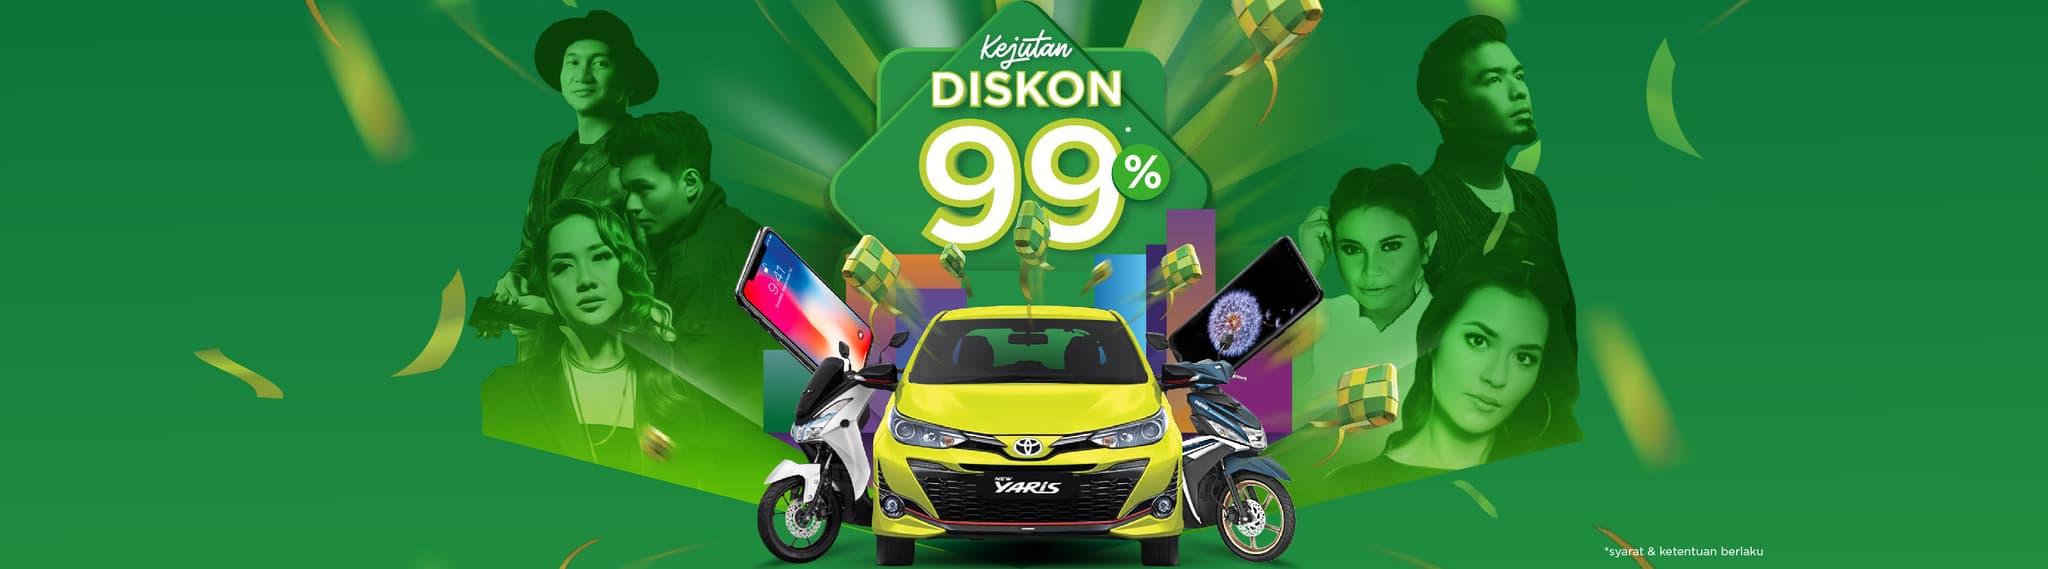 Ramadan Ekstra Tokopedia diskon 99%